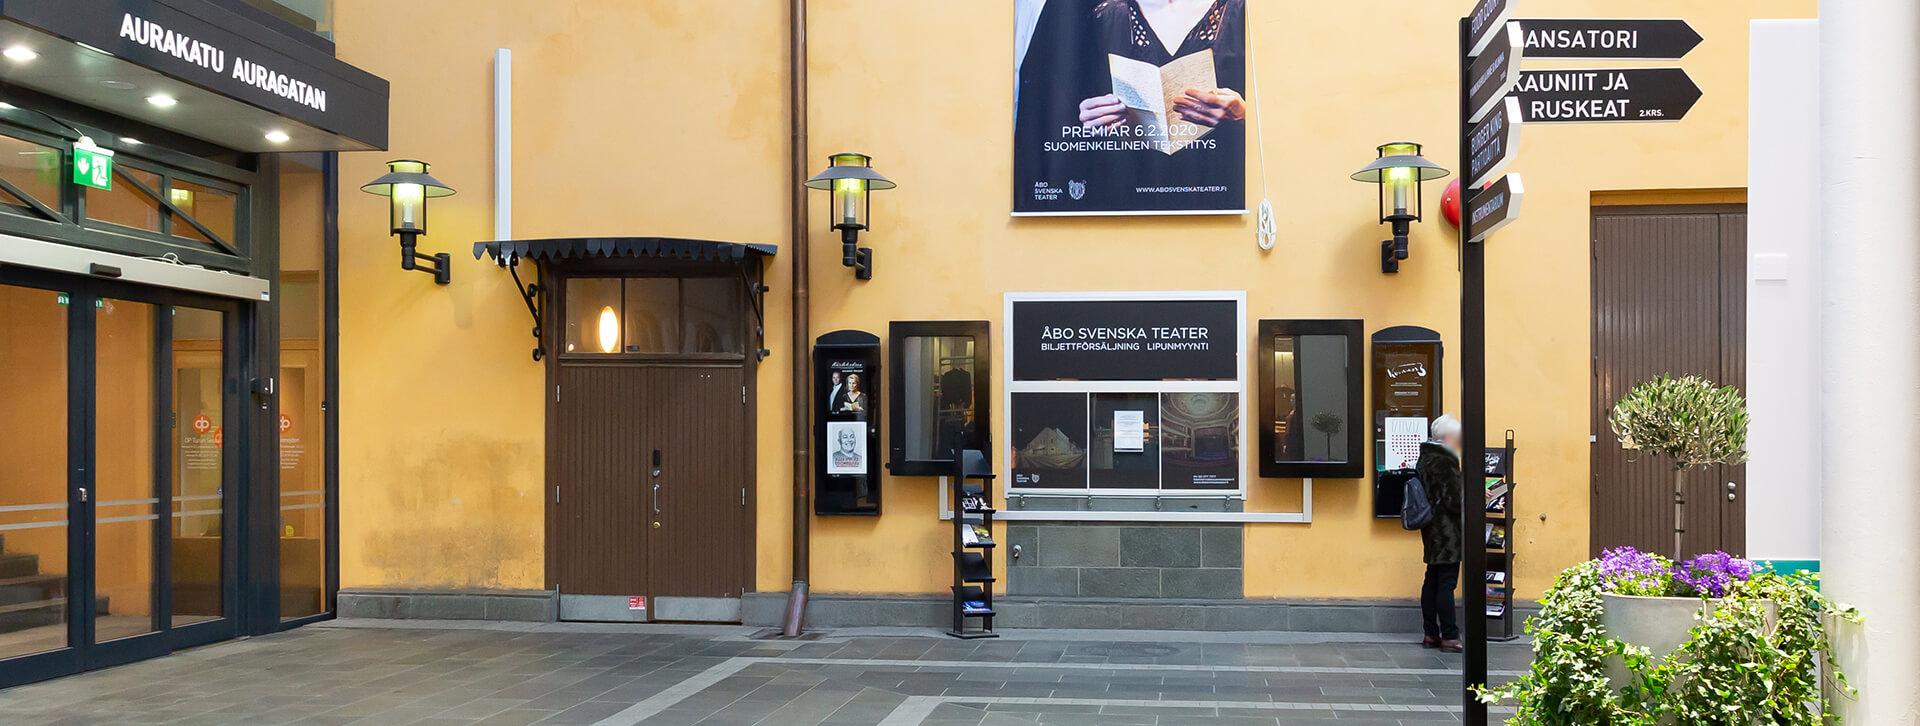 abo-svenska-teater-1